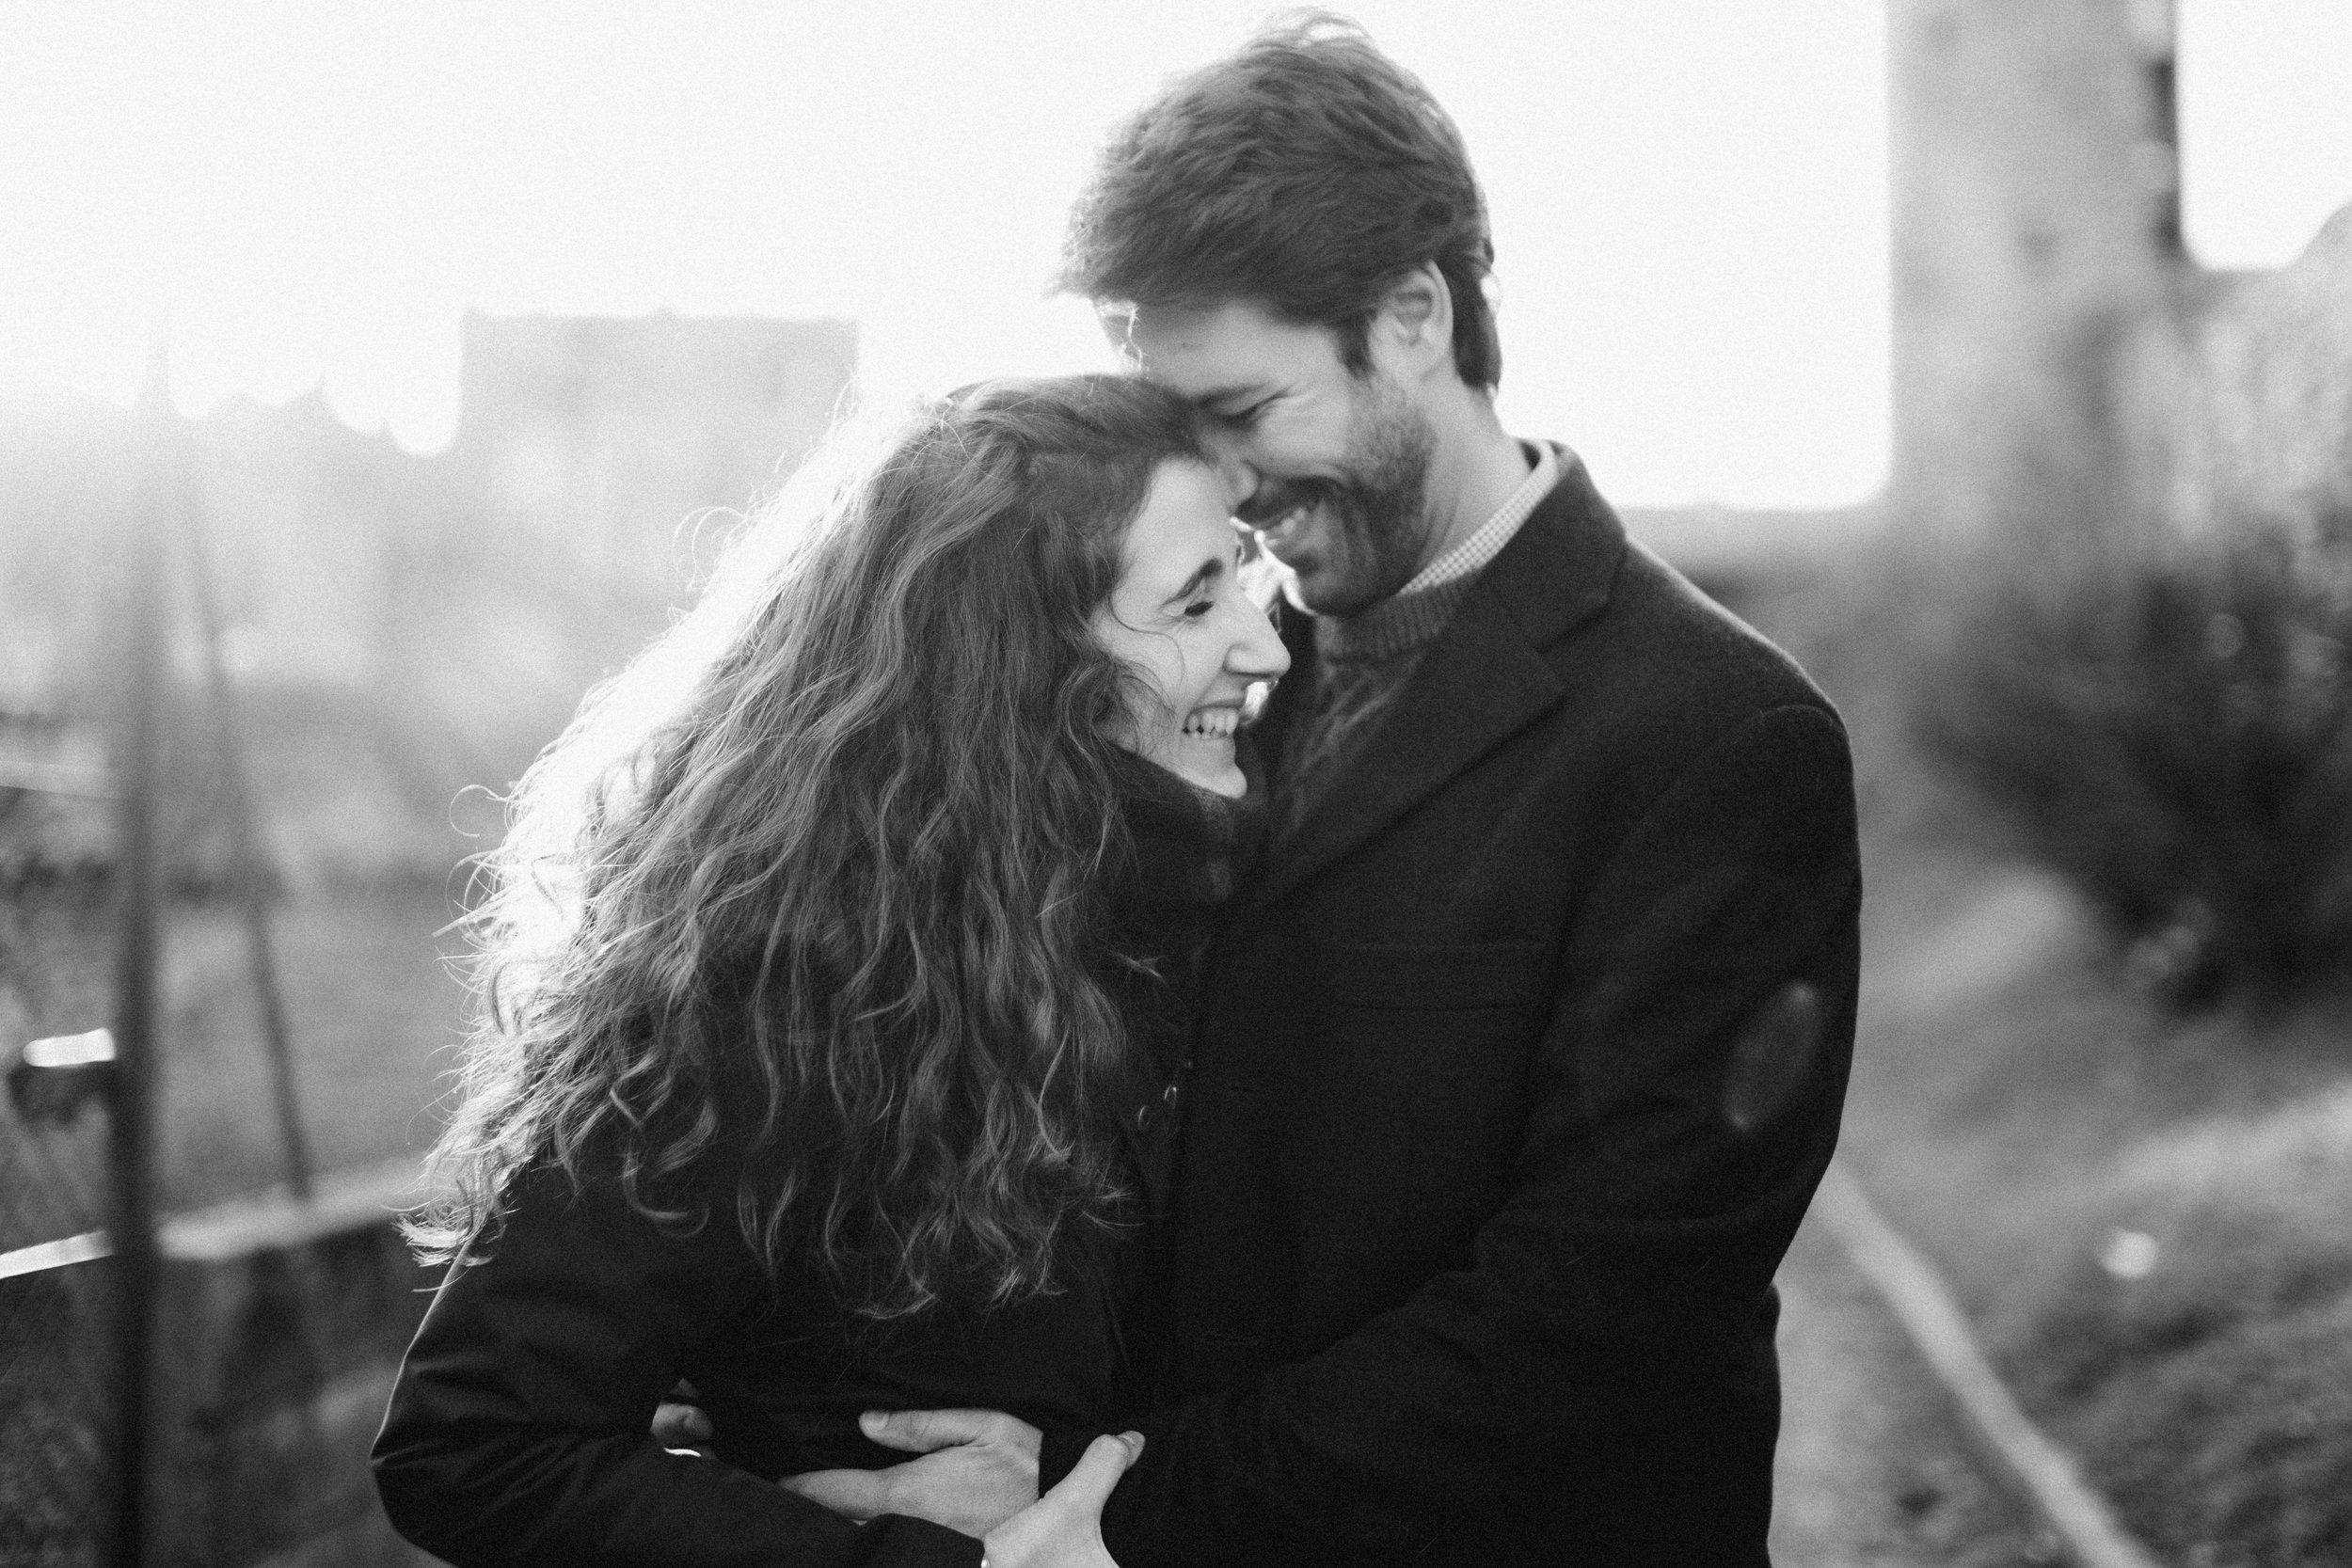 005 - Elisa + Riccardo - engagement.JPG